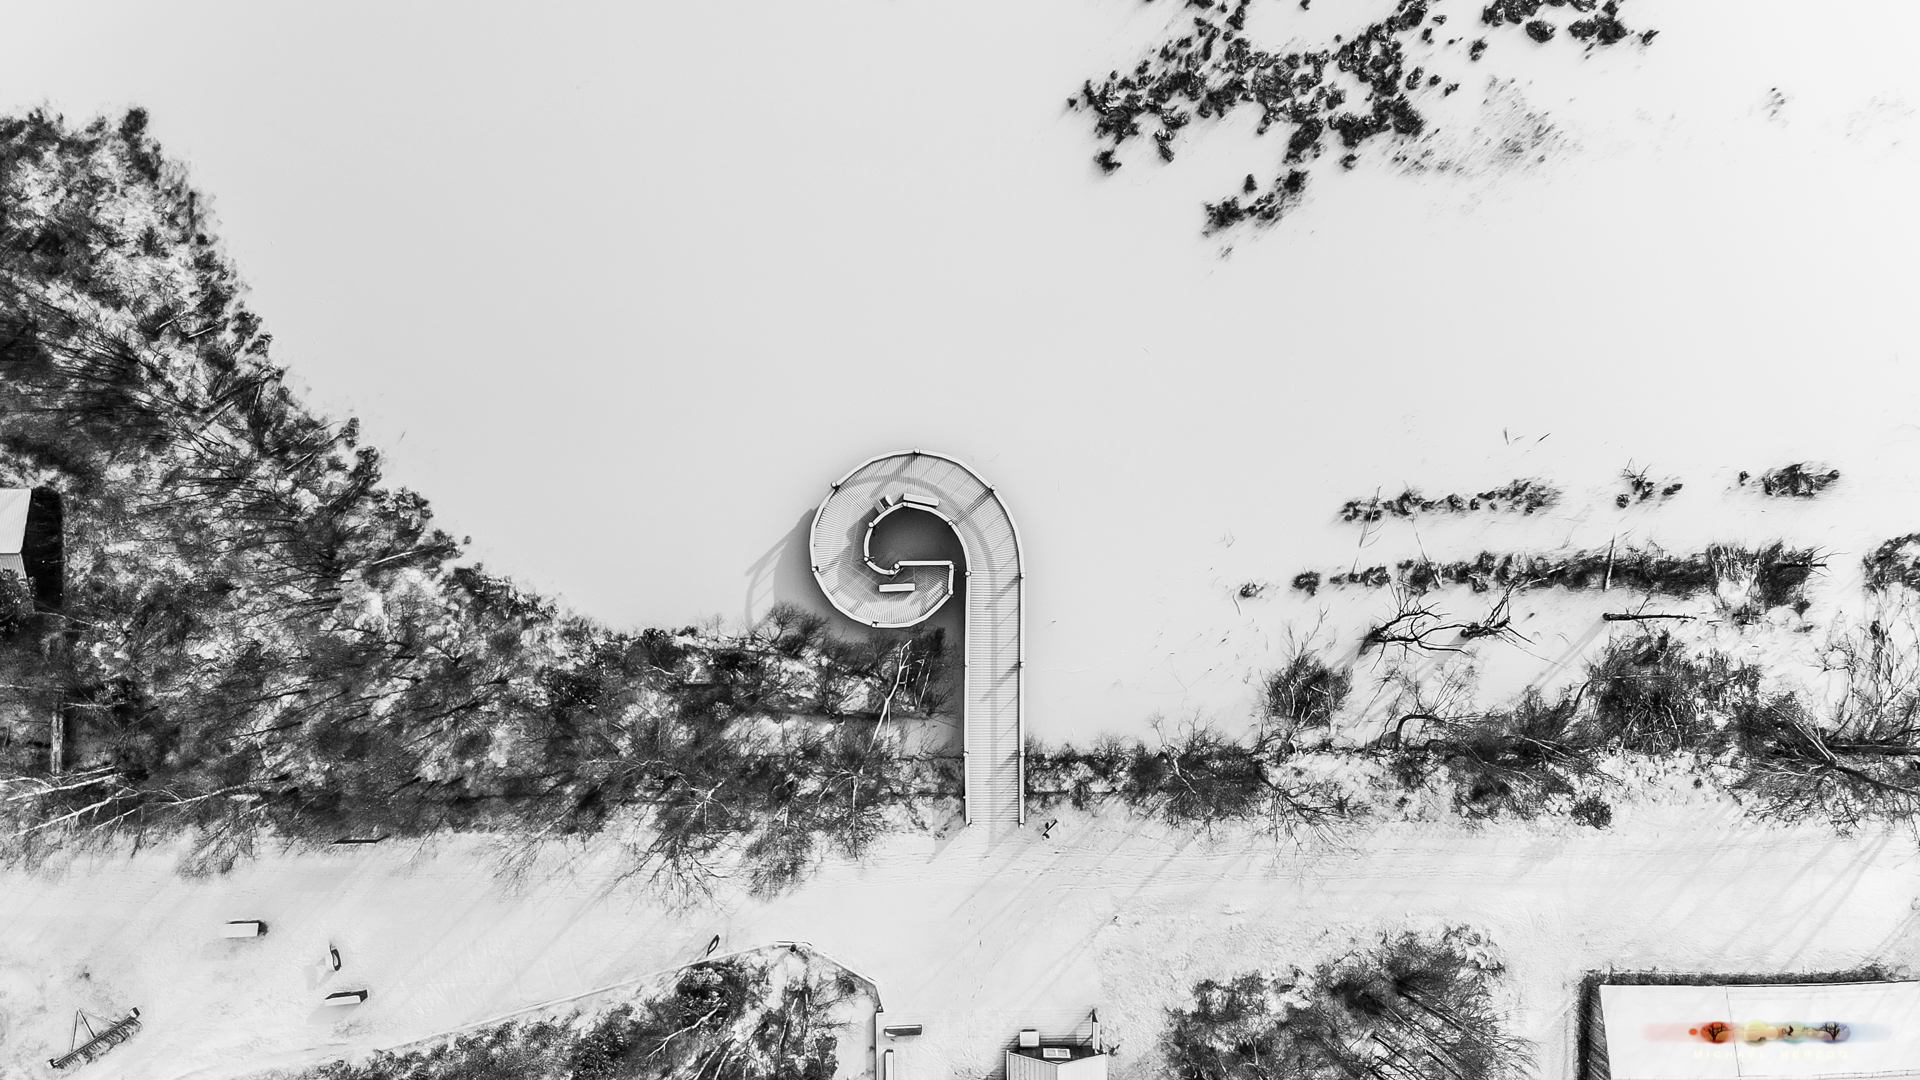 AUTrenalinMEDIA-Drone-14.jpg